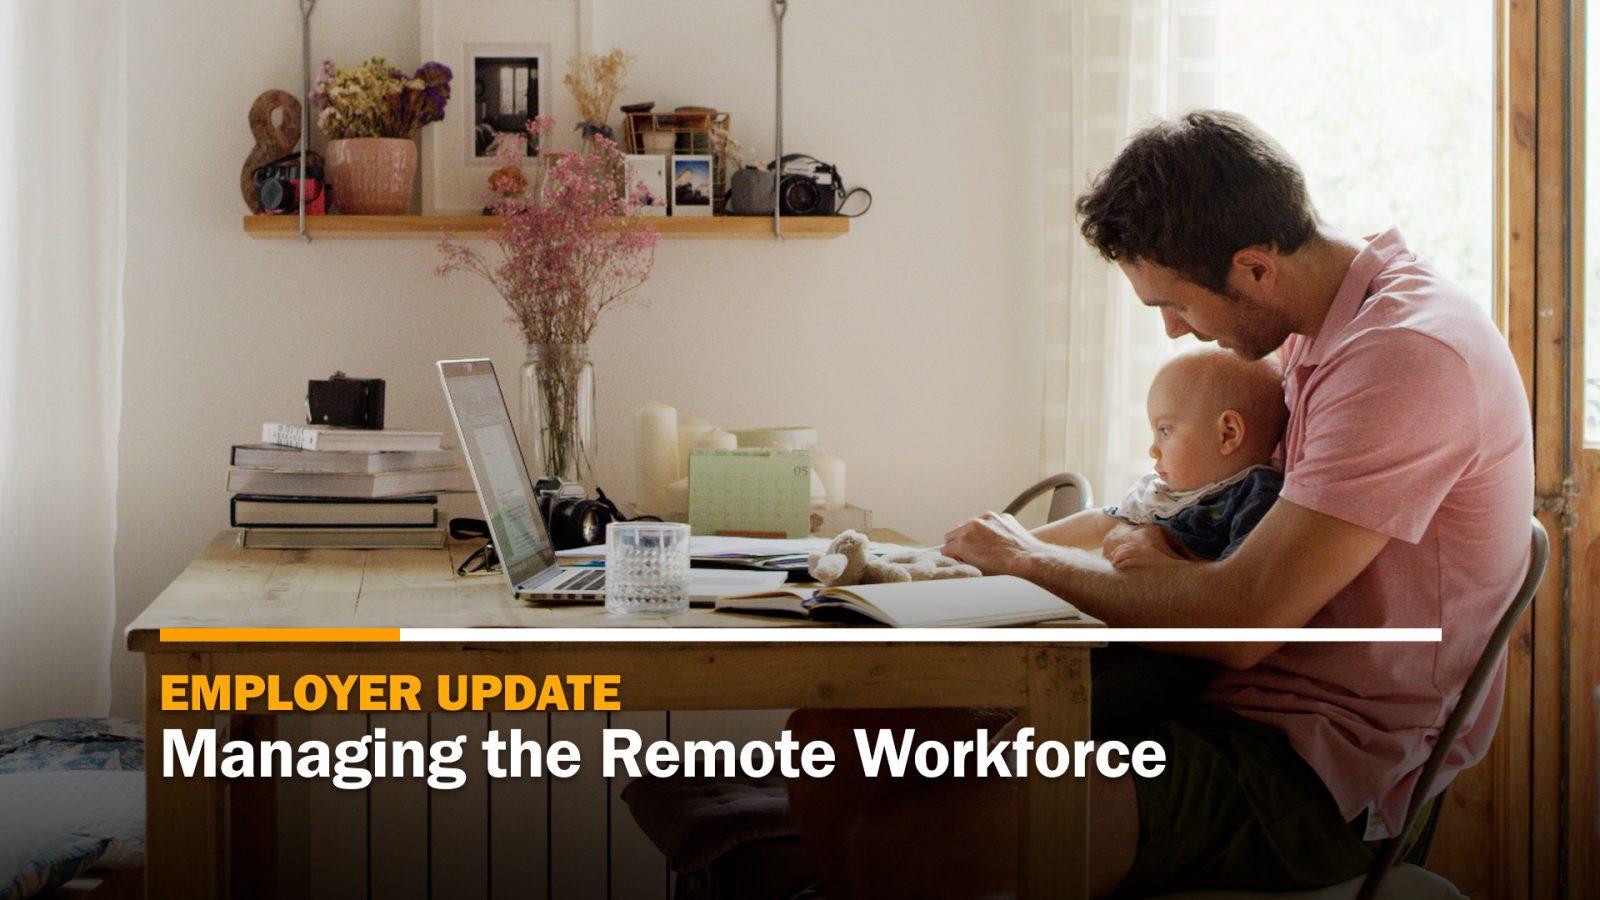 Managing the Remote Workforce